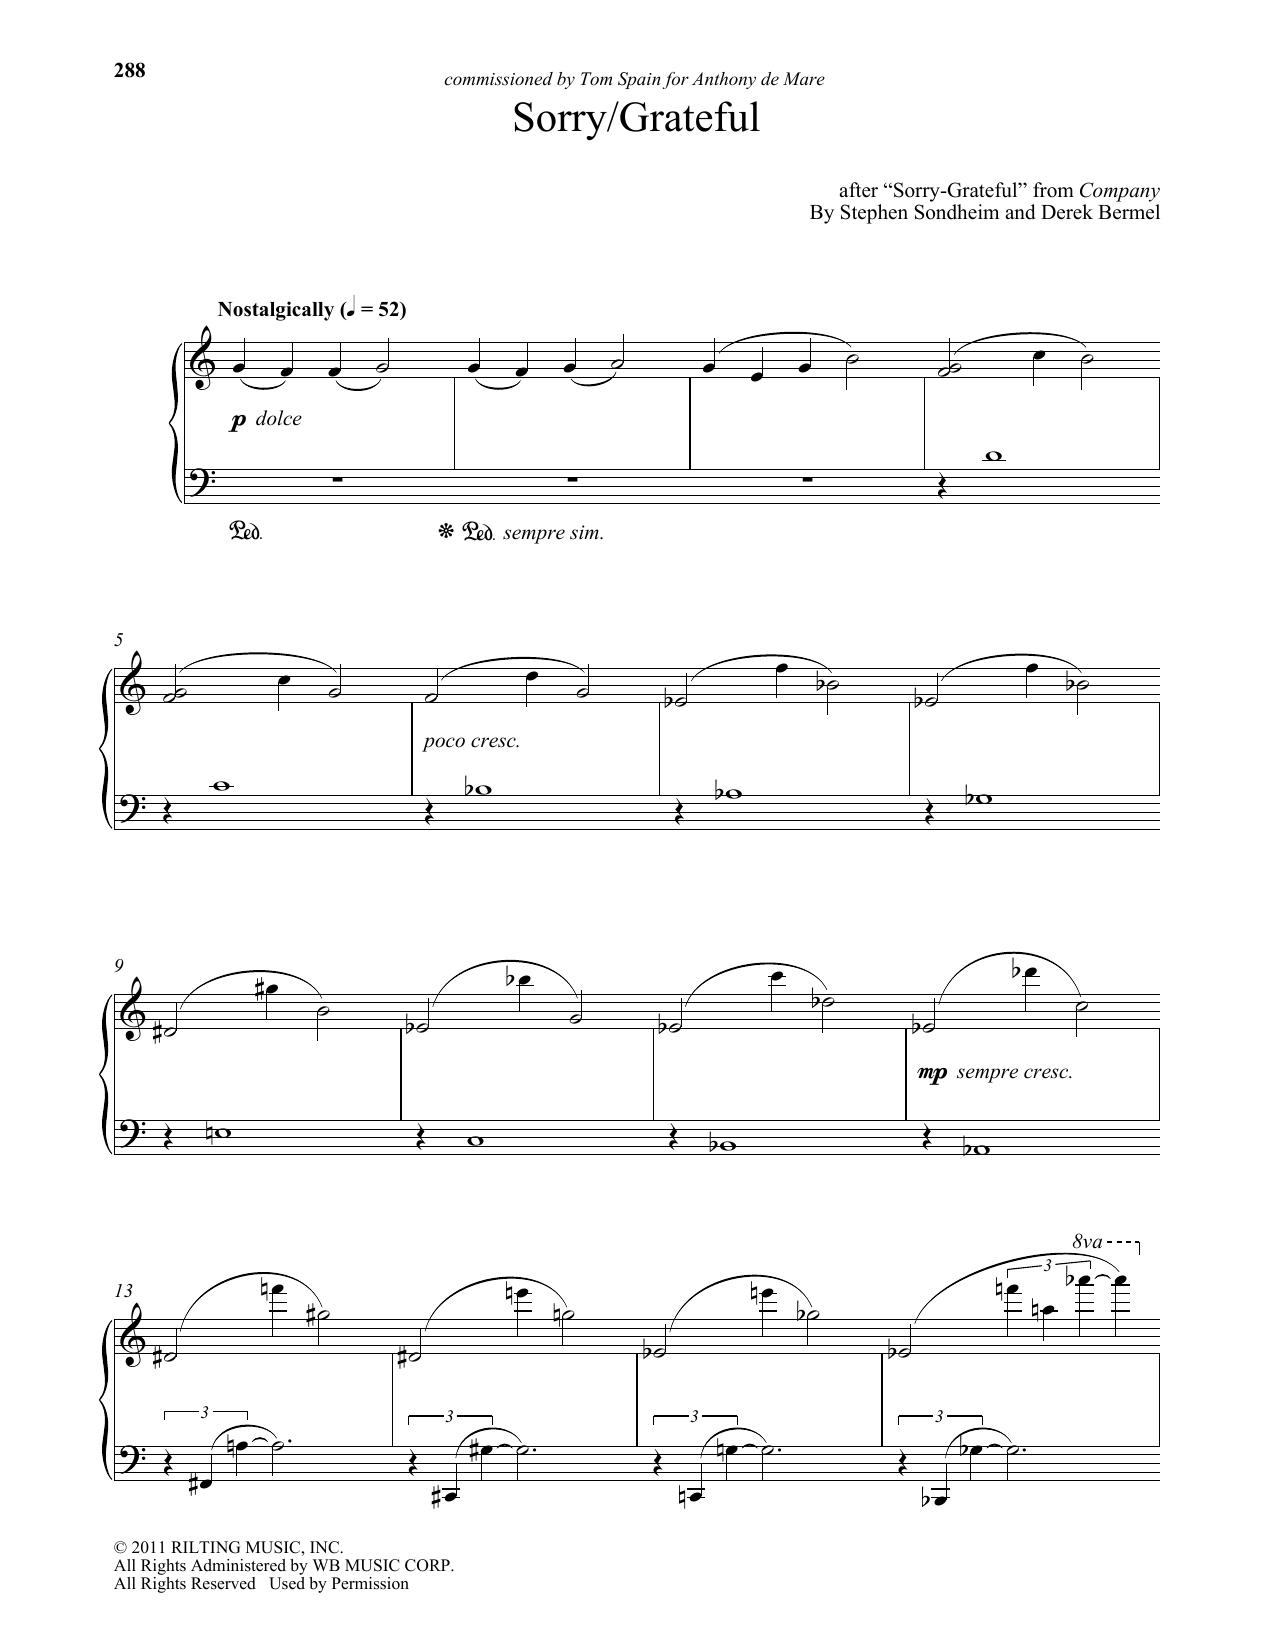 Sorry - Grateful (arr. Derek Bermel) Sheet Music